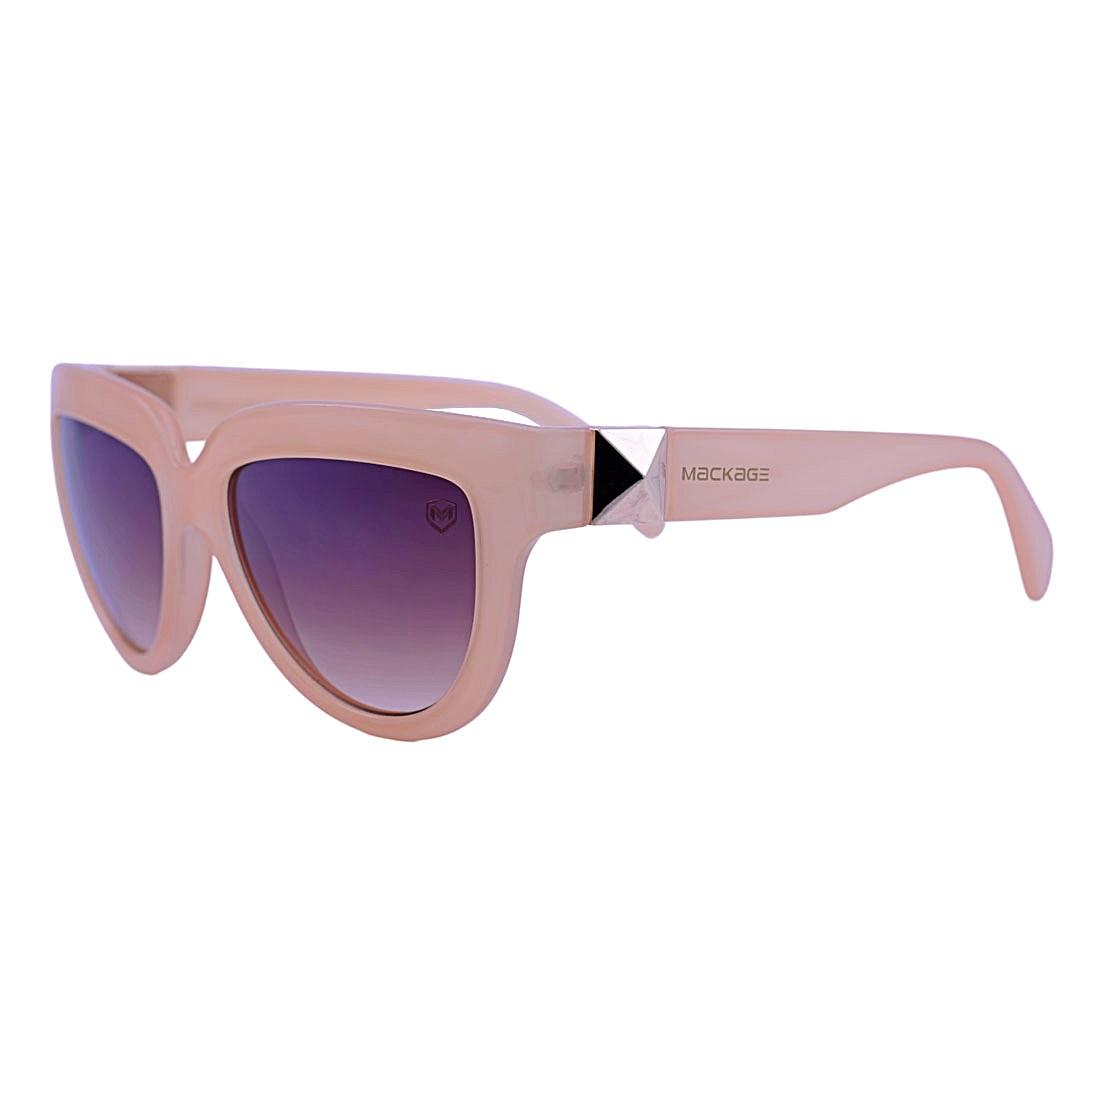 Óculos De Sol Mackage Feminino Acetato Gateado Oversize - Nude